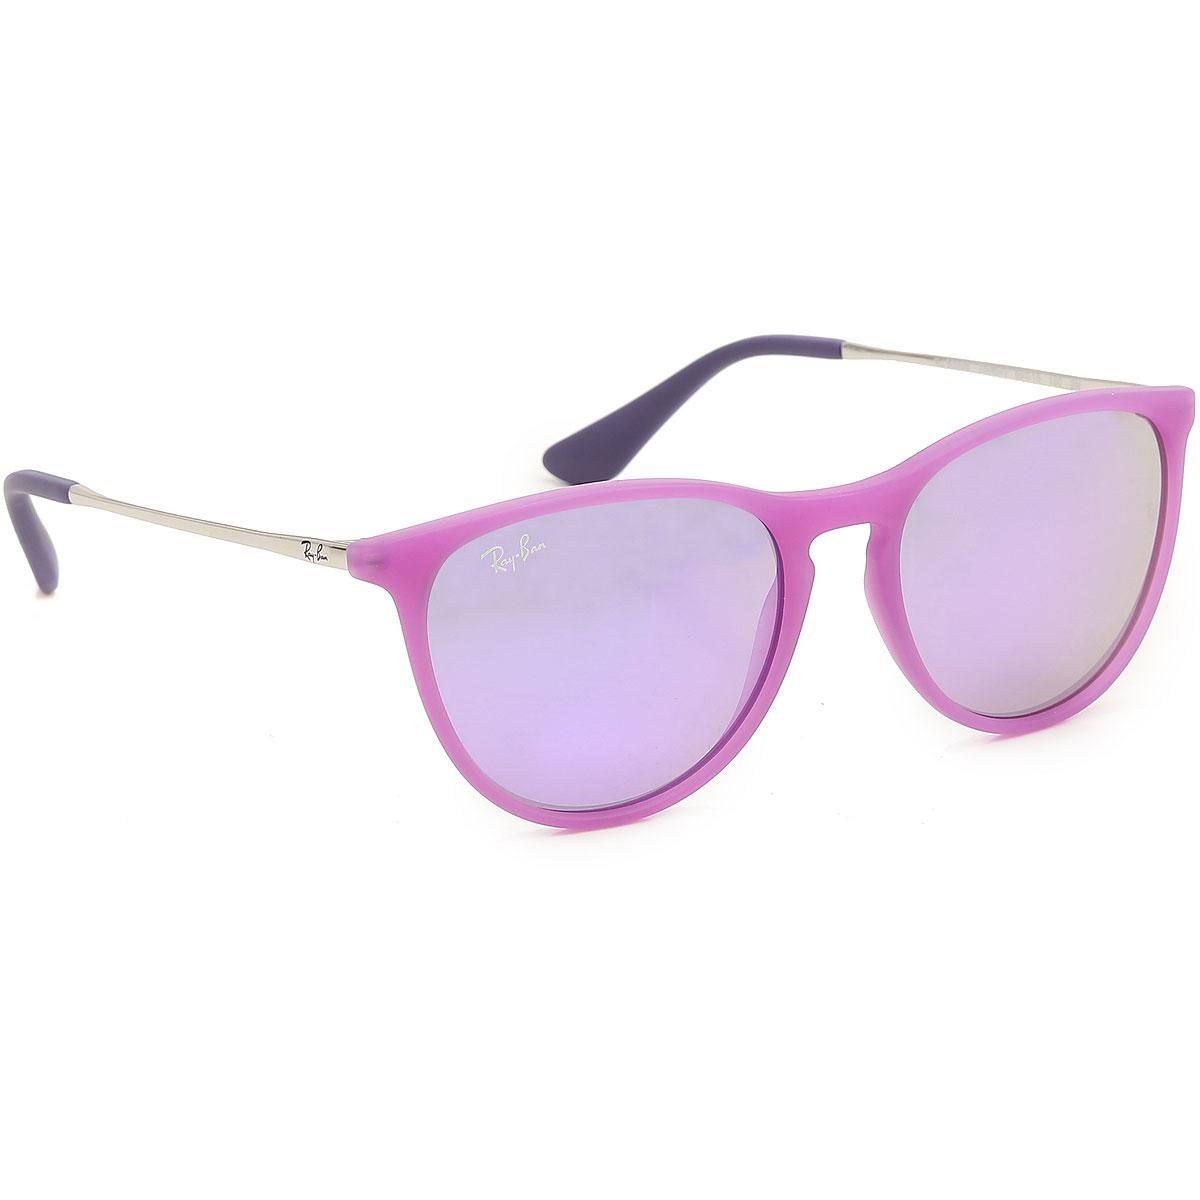 2aec7f758 Girls Clothing Ray Ban Junior, Style code: rj9060-7008-4v